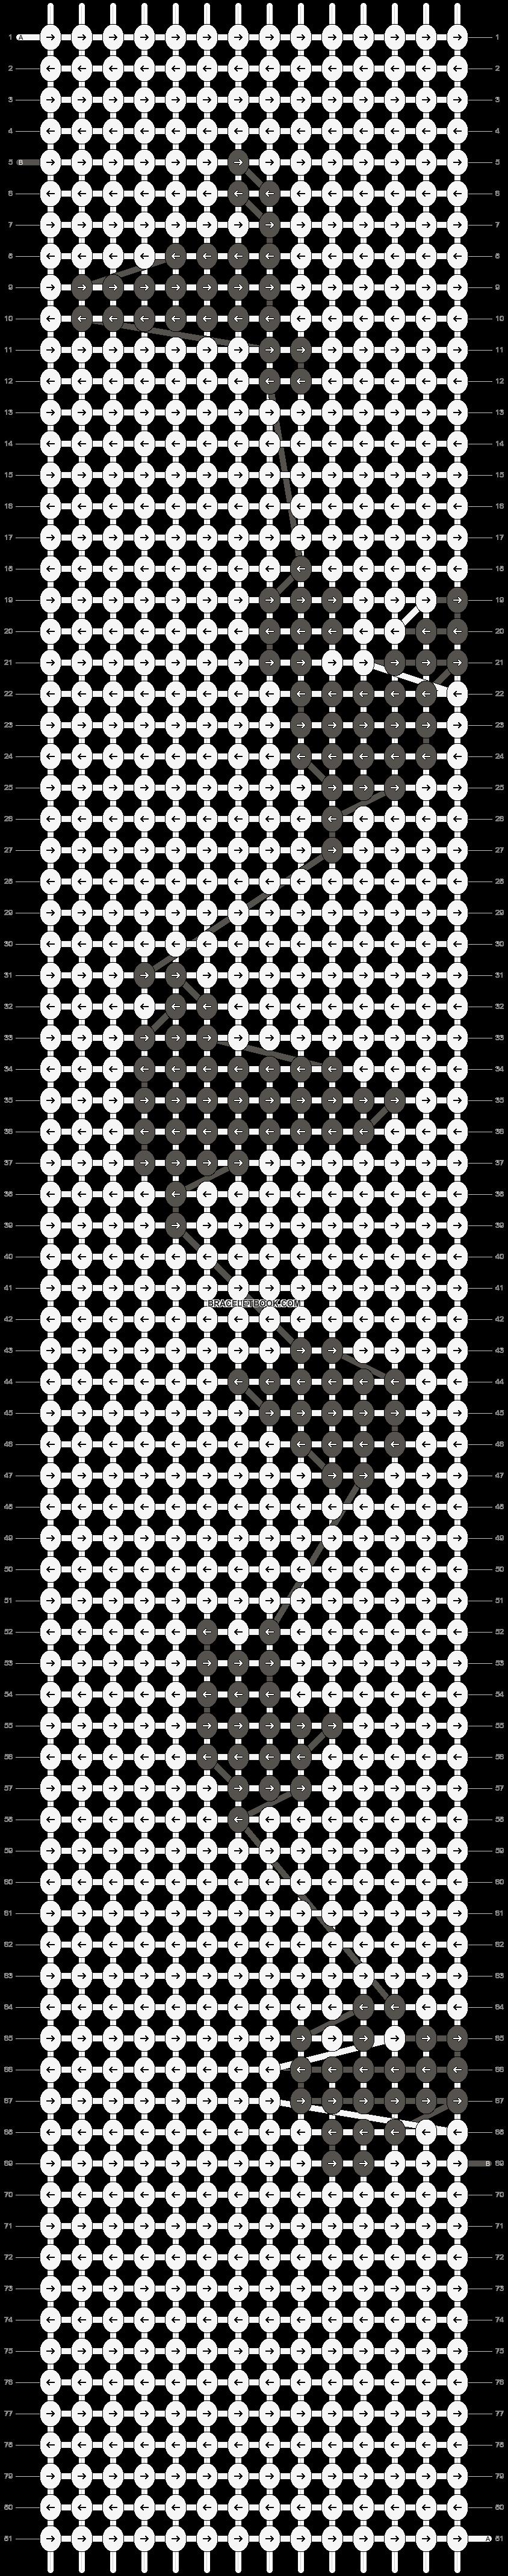 Alpha pattern #13440 pattern